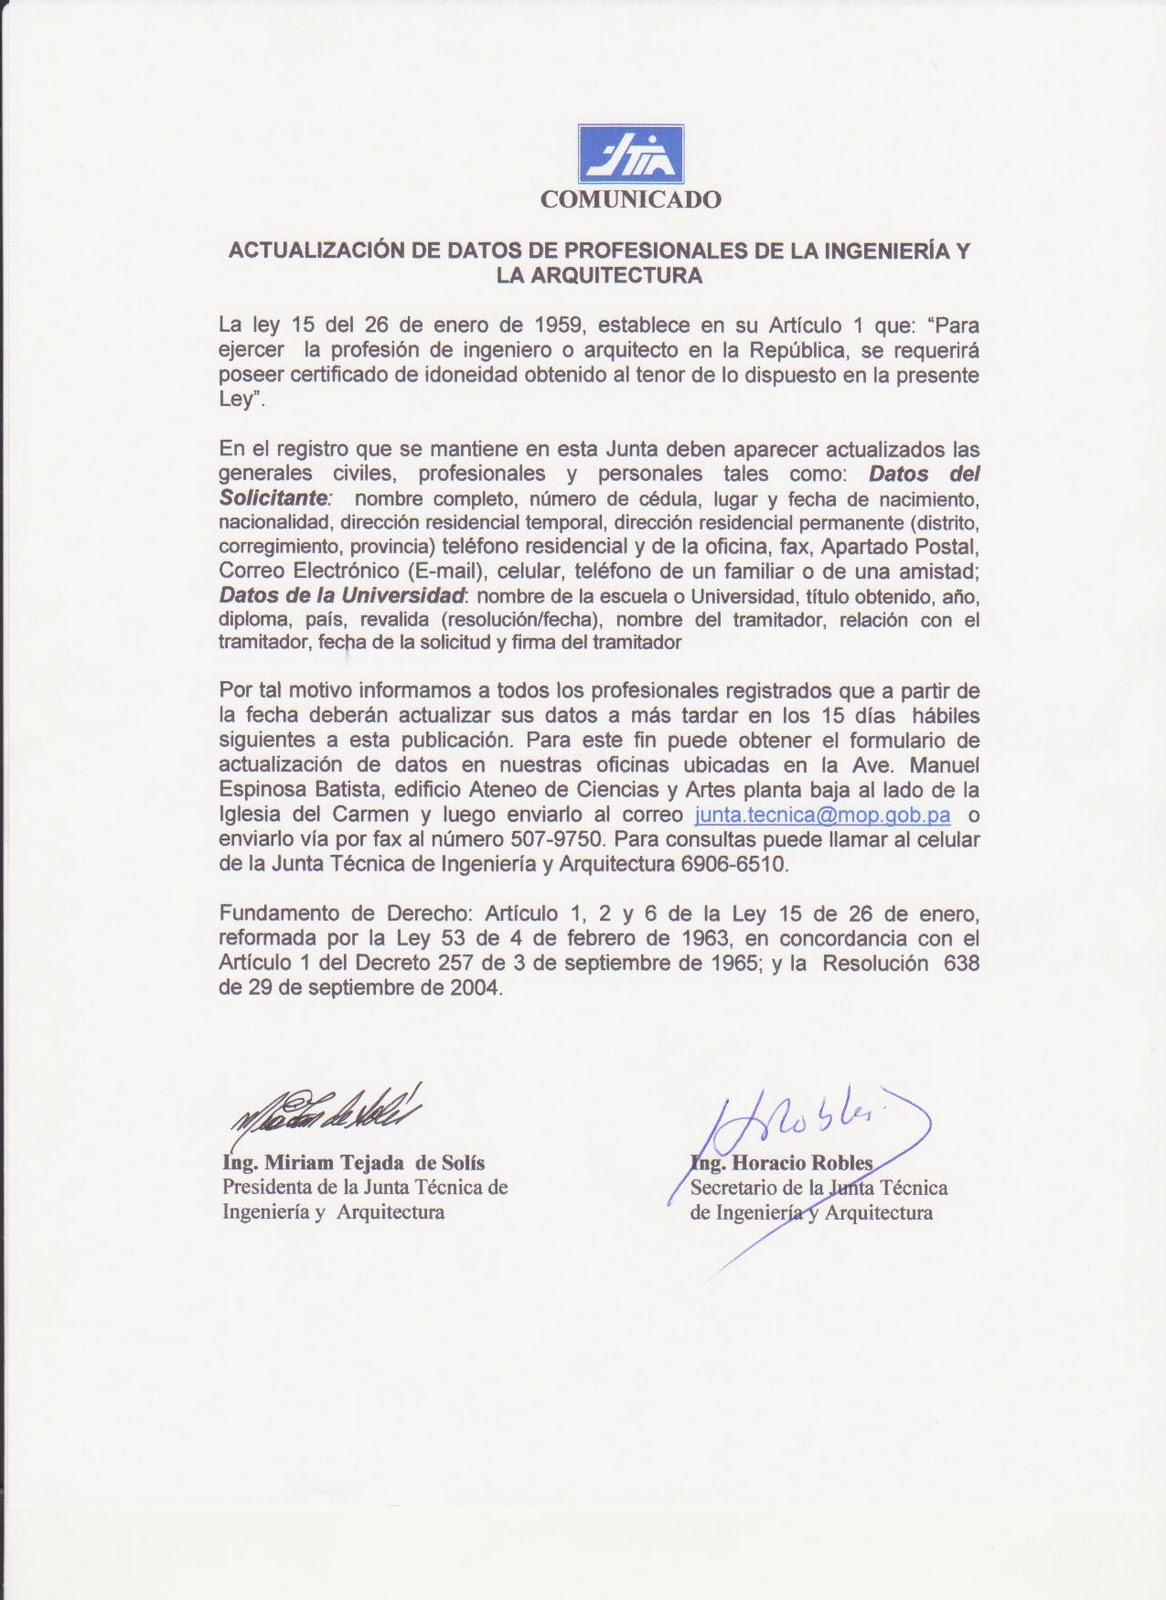 COLEGIO DE INGENIEROS CIVILES DE PANAMA: 2010